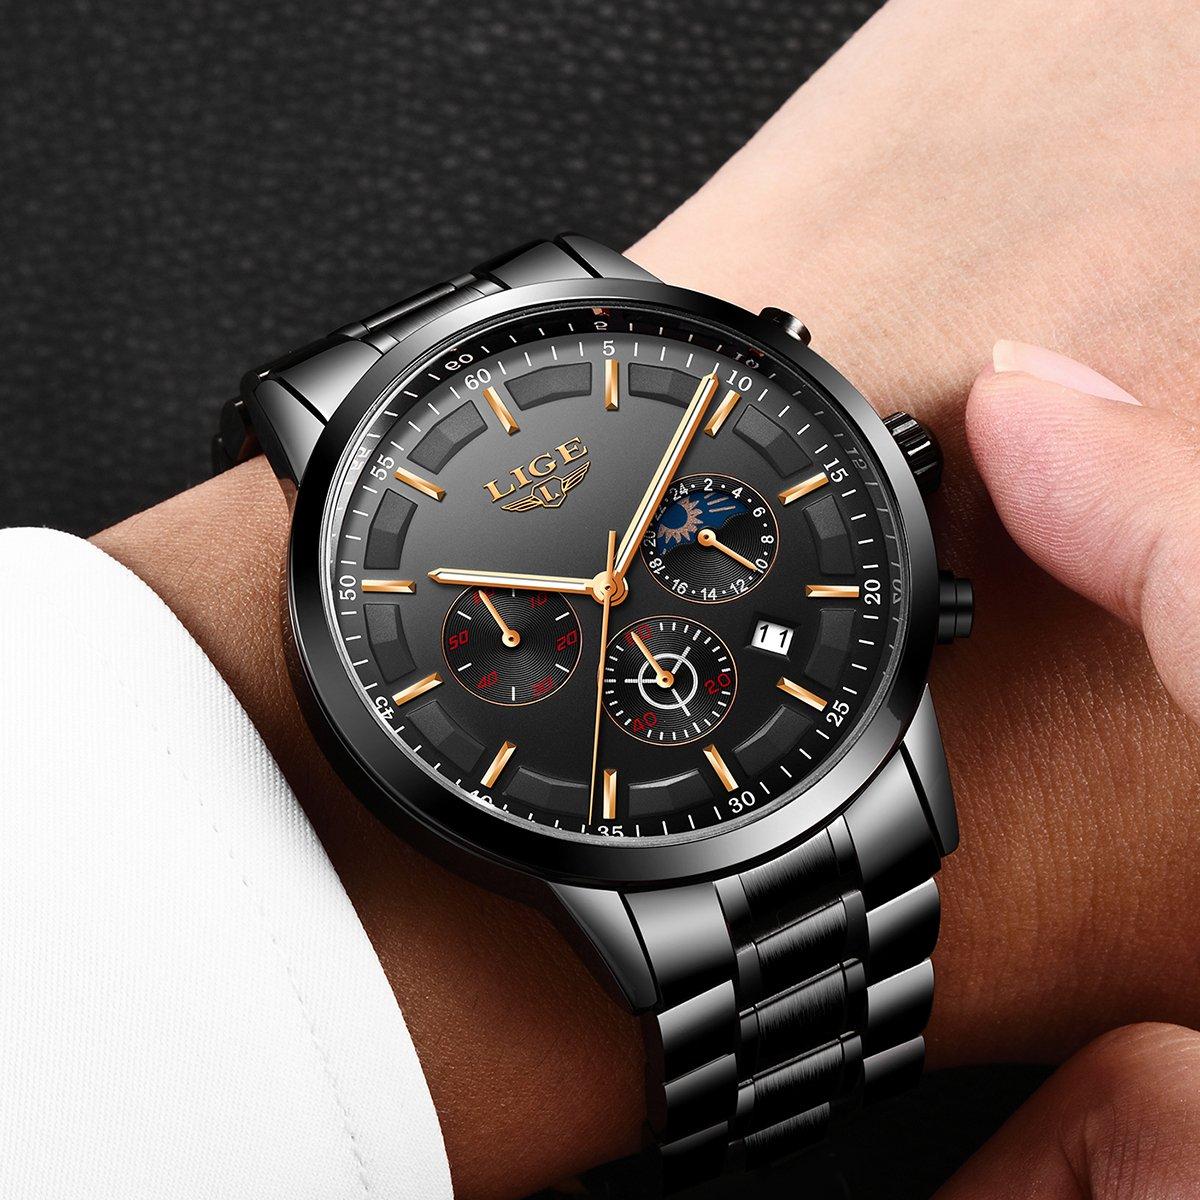 bf5658a79e60 LIGE Relojes Hombre Impermeable Deporte Cuarzo Analógico Reloj ...